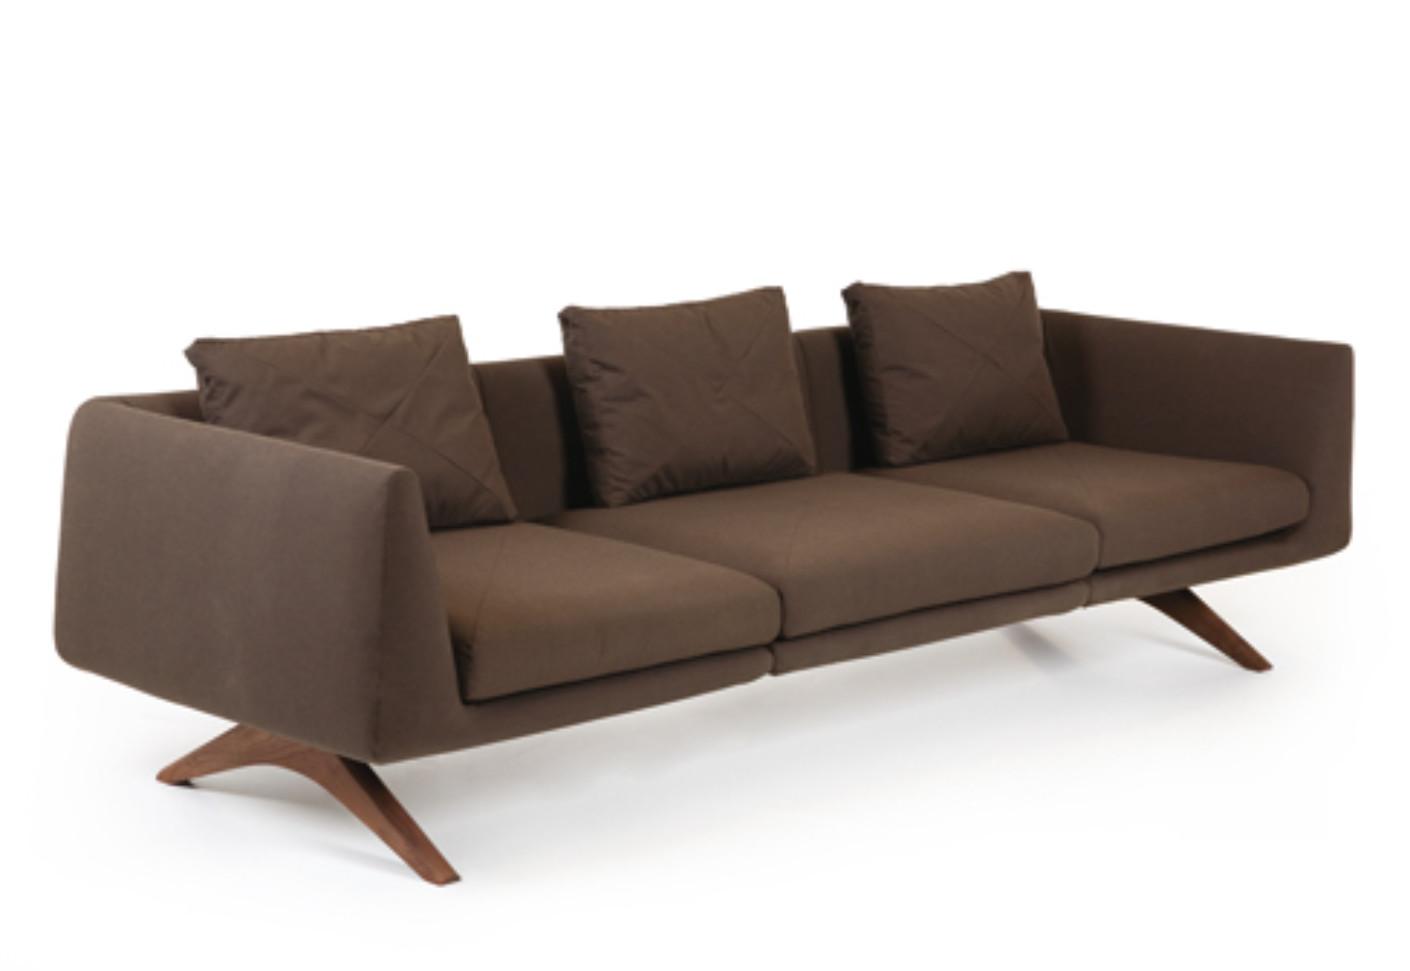 Hepburn Sofa By Matthew Hilton Stylepark